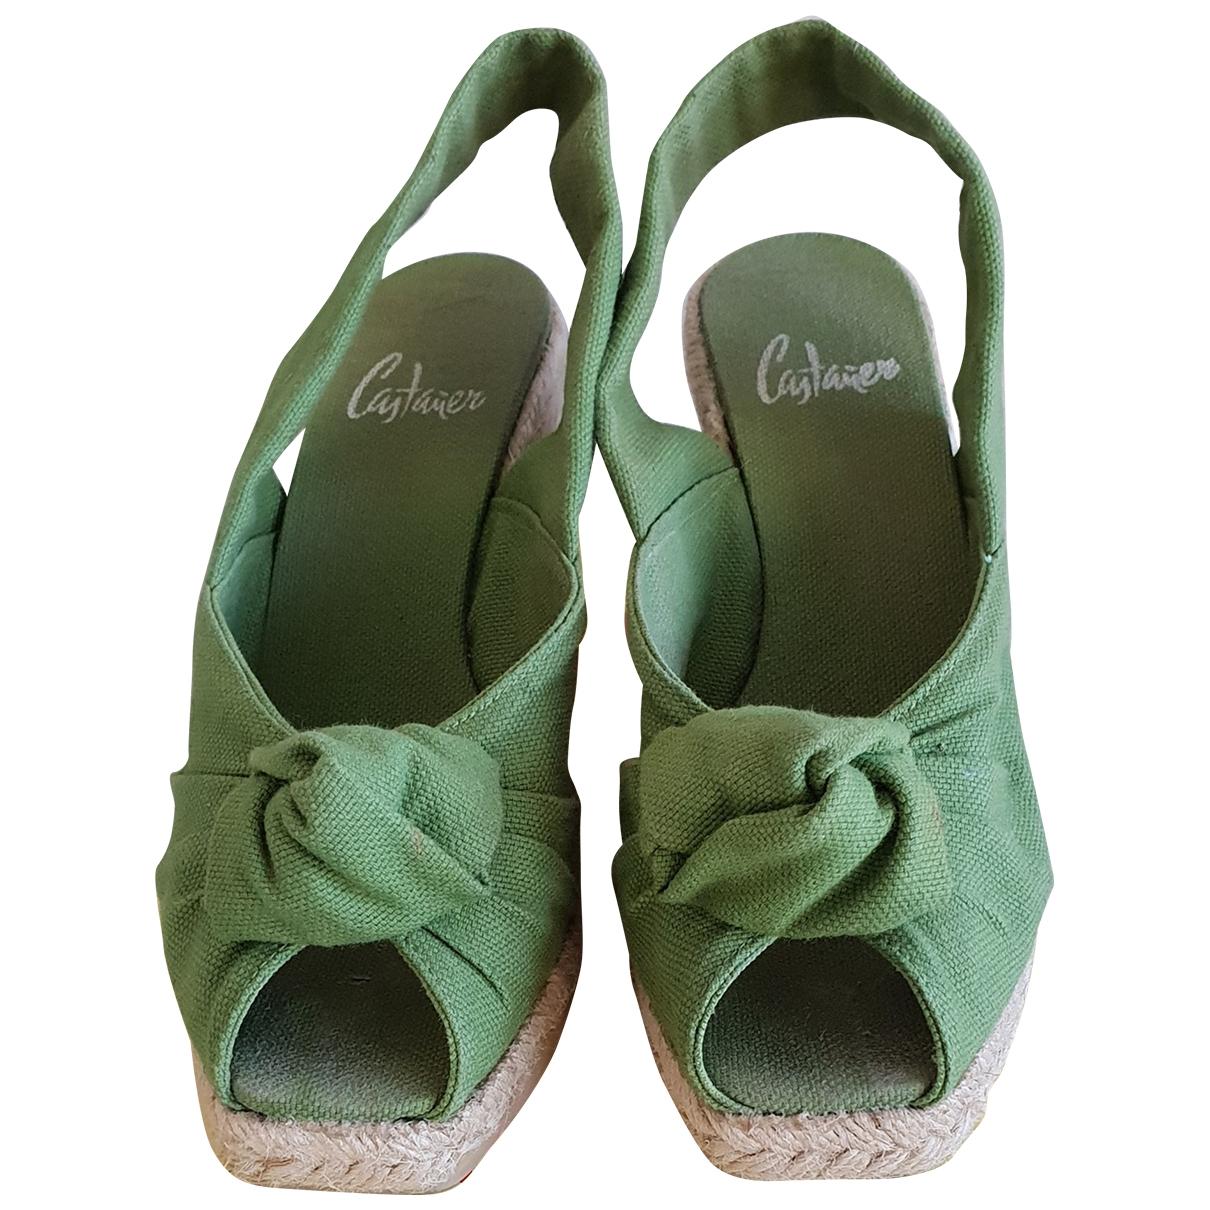 Castaner - Espadrilles   pour femme en denim - vert